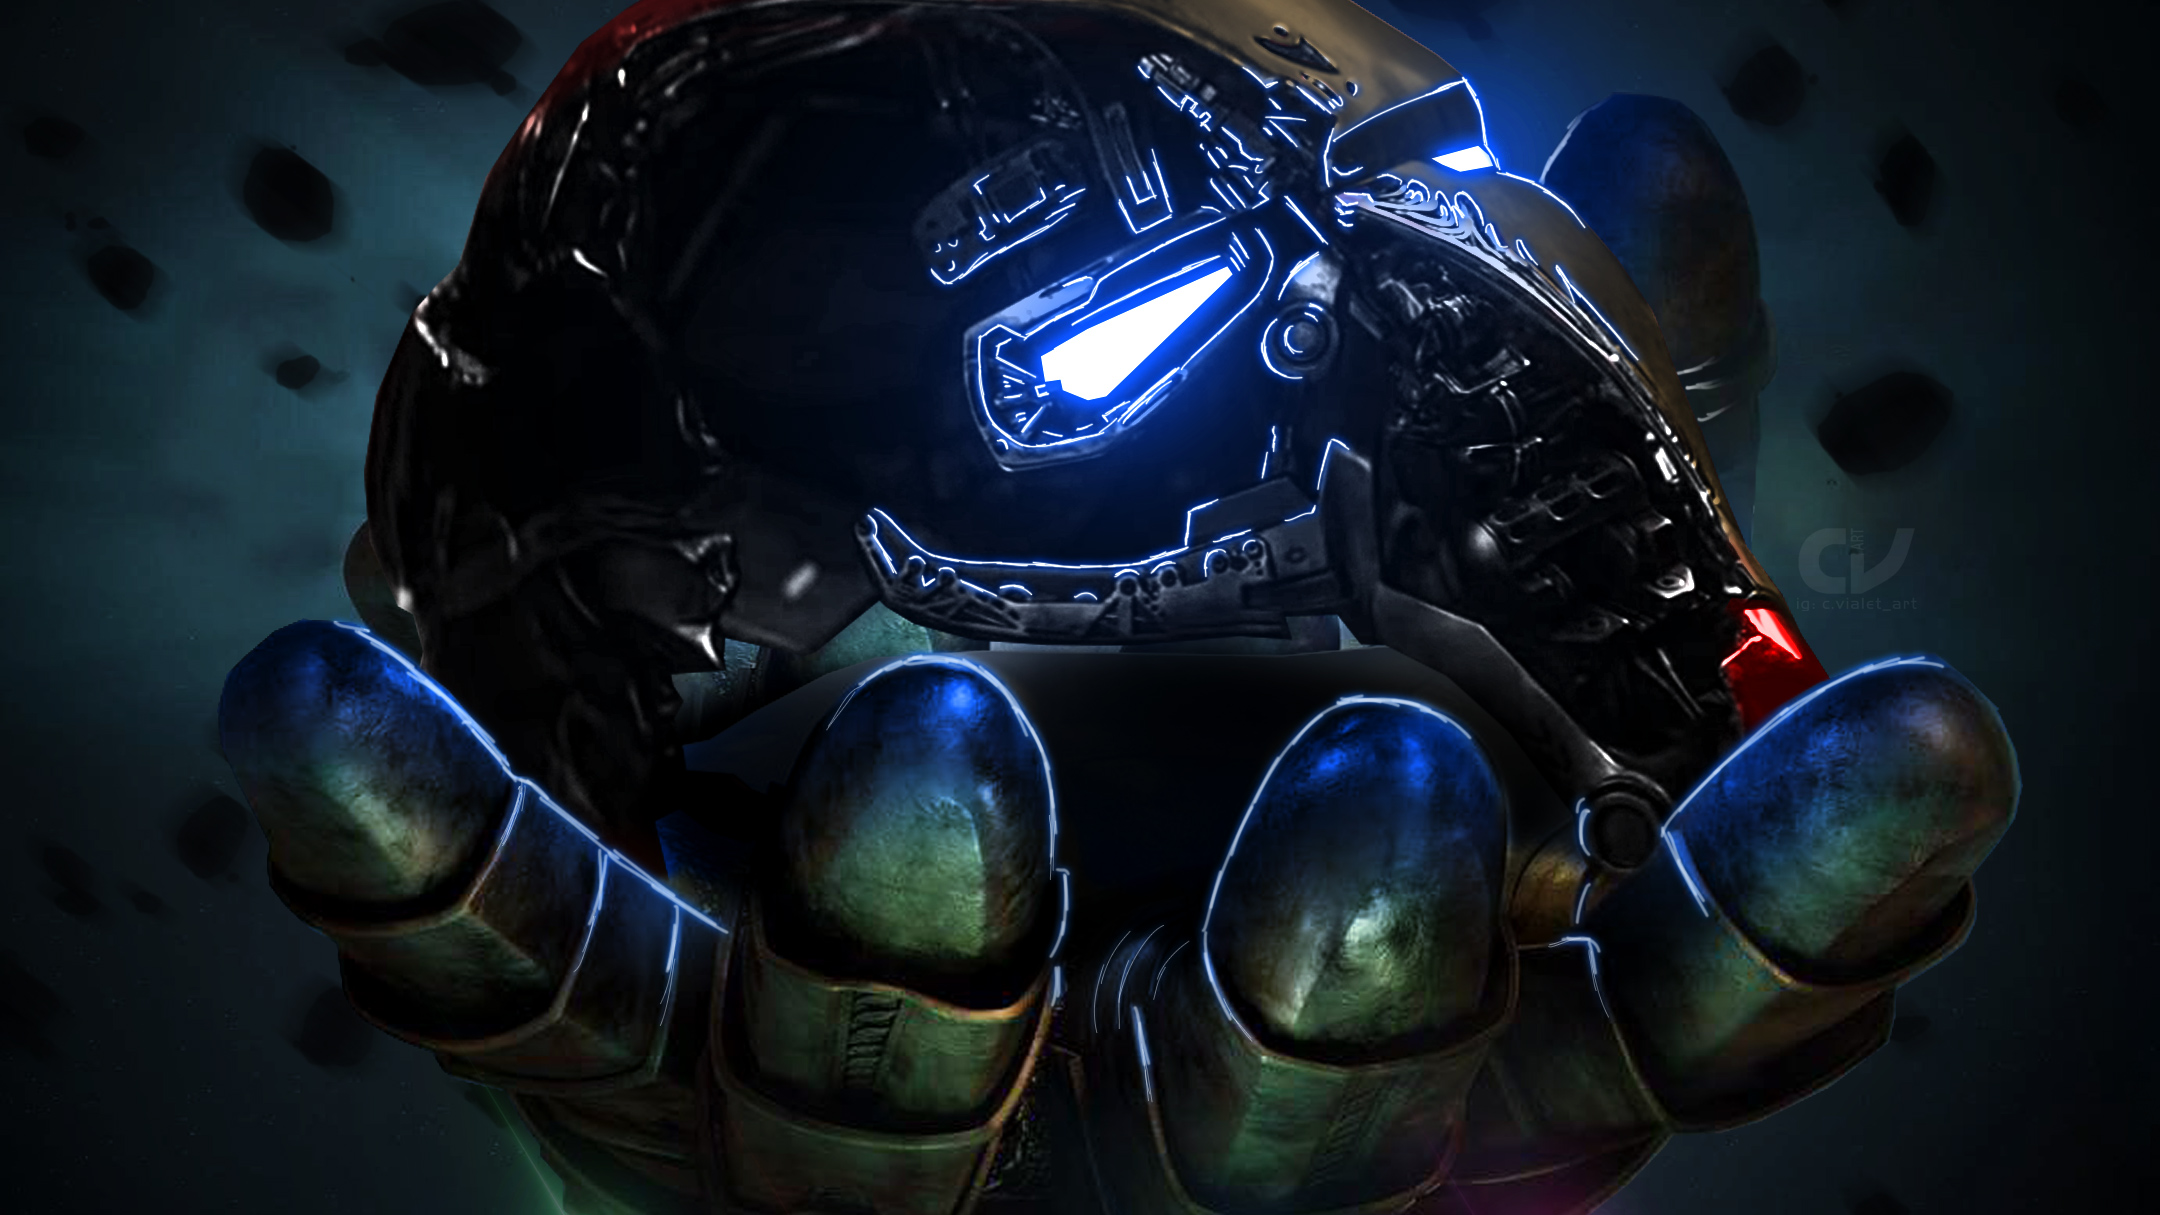 Thanos infinity gauntlet holding iron man mask hd for Sfondi iron man